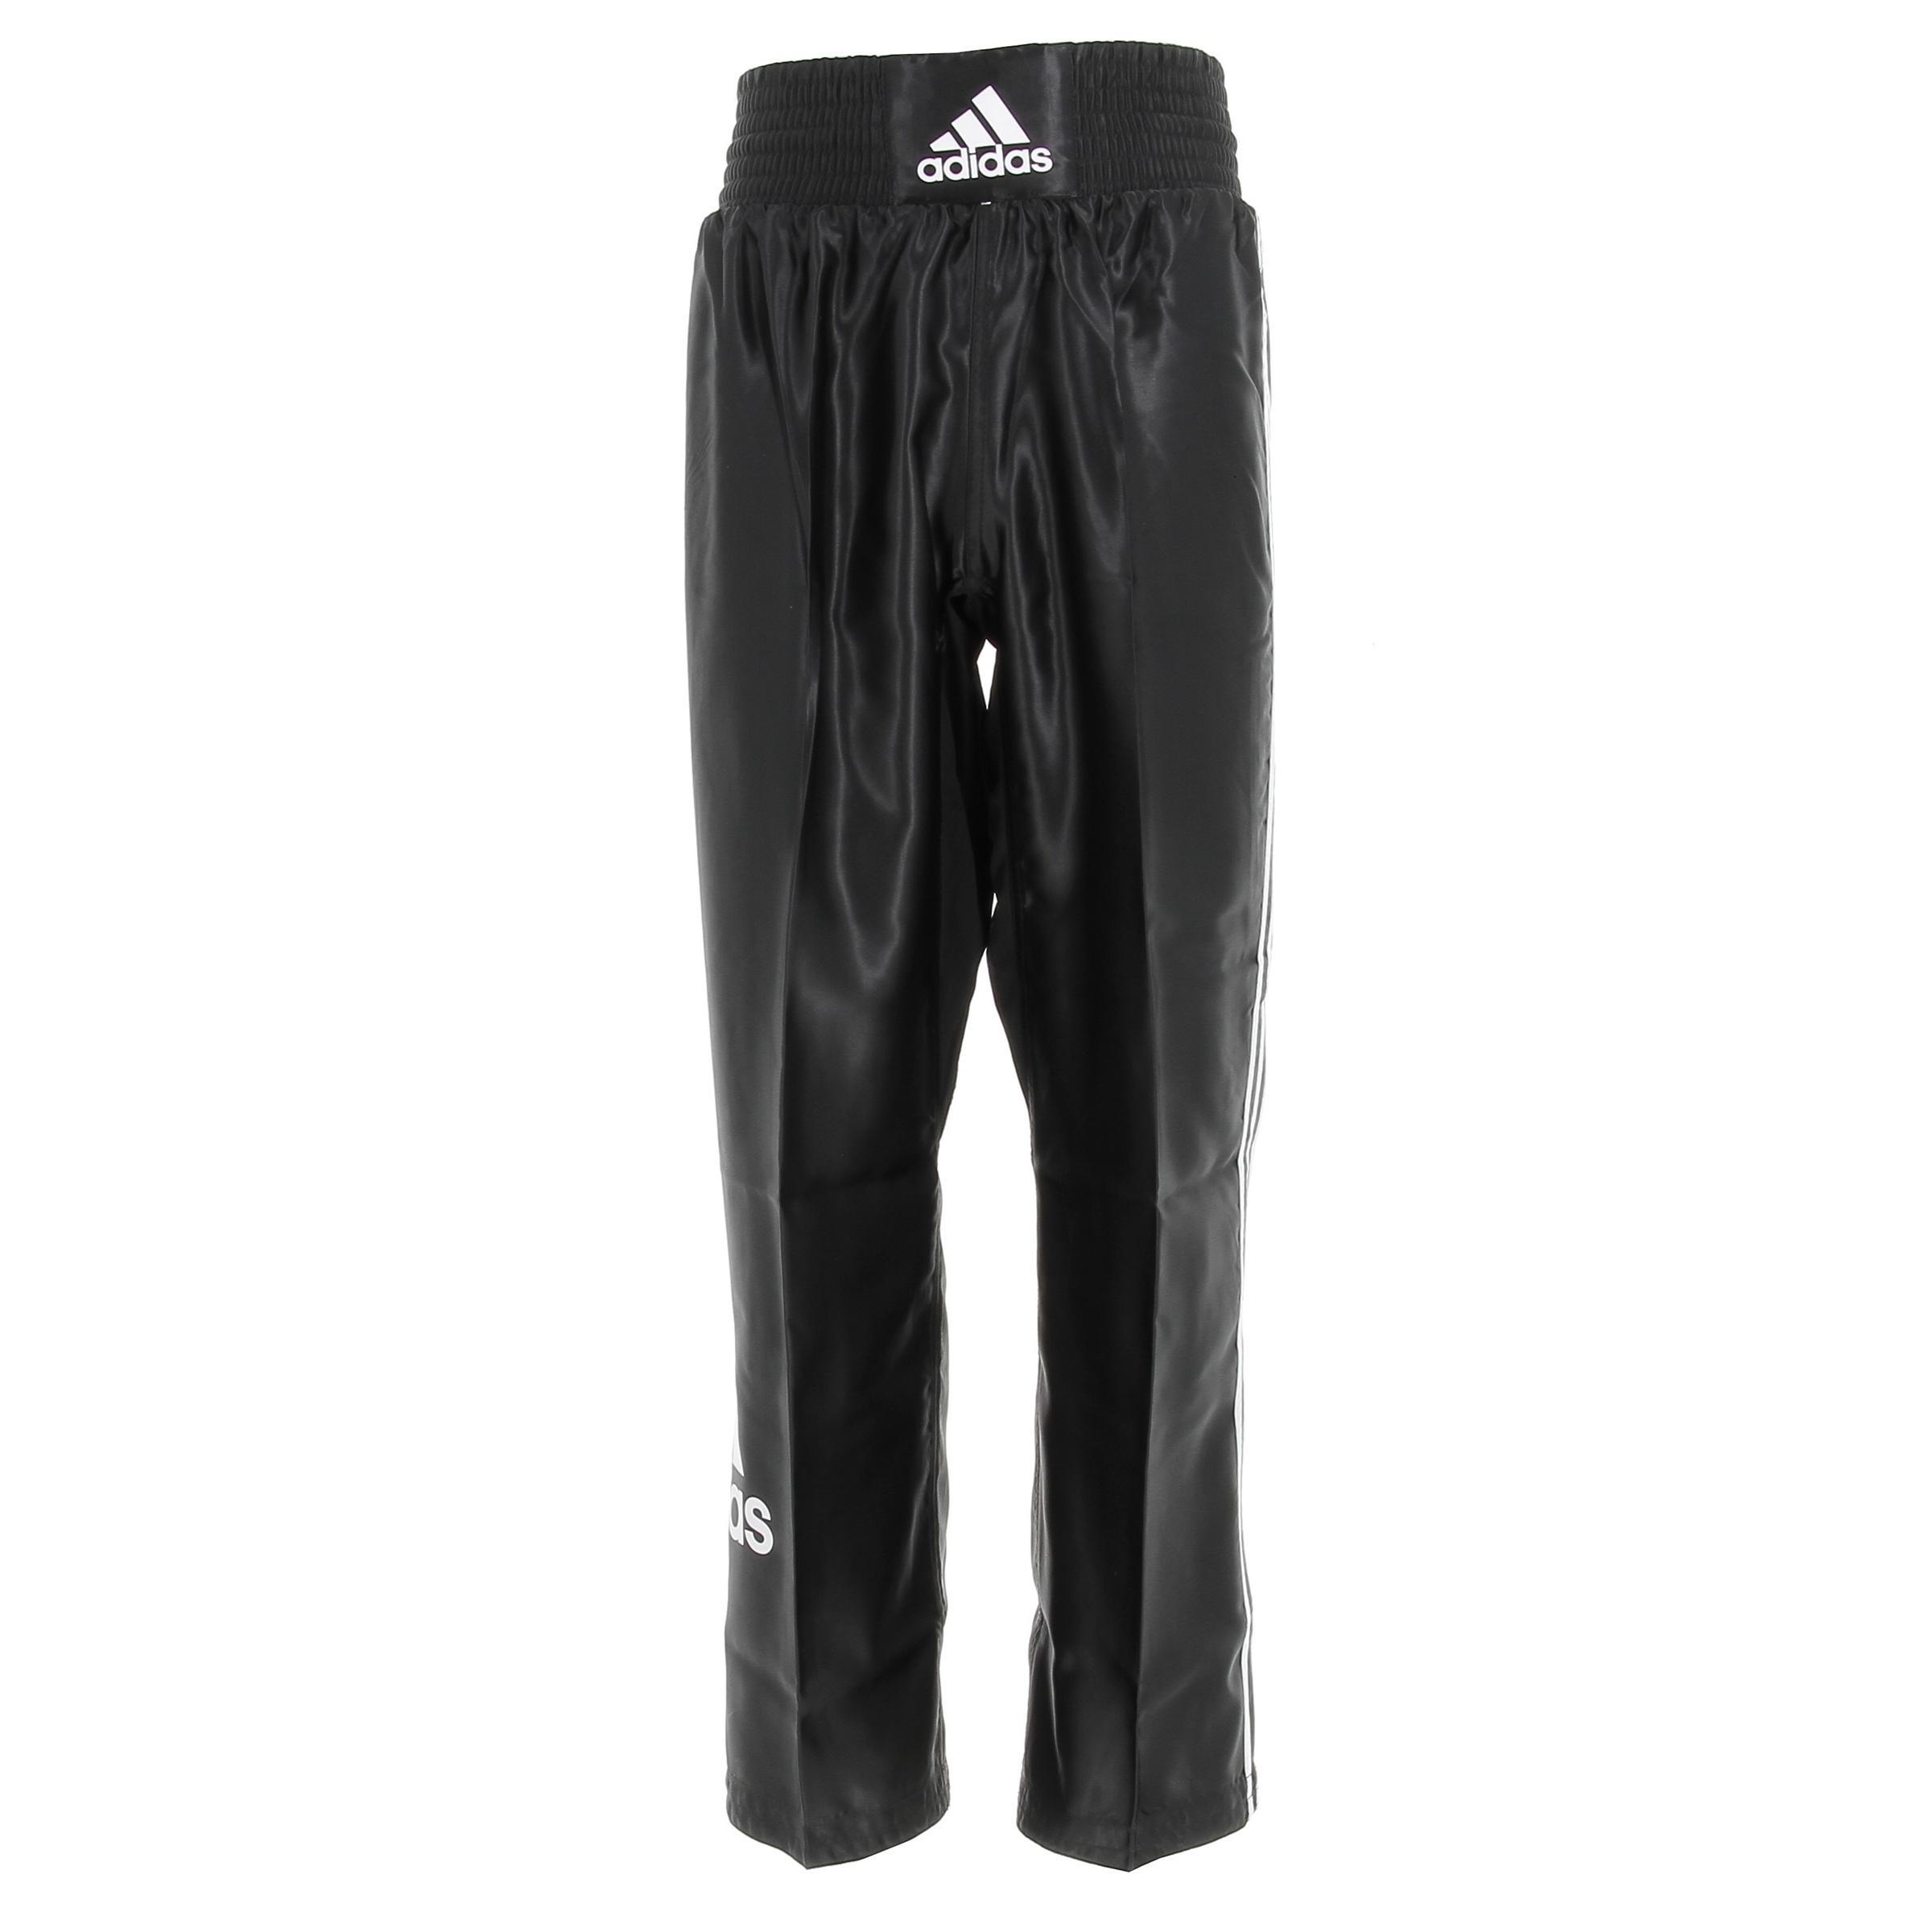 Pants-Boxing-Kickboxing-Adidas-Pant-Kick-Full-Black-Black-23092-New